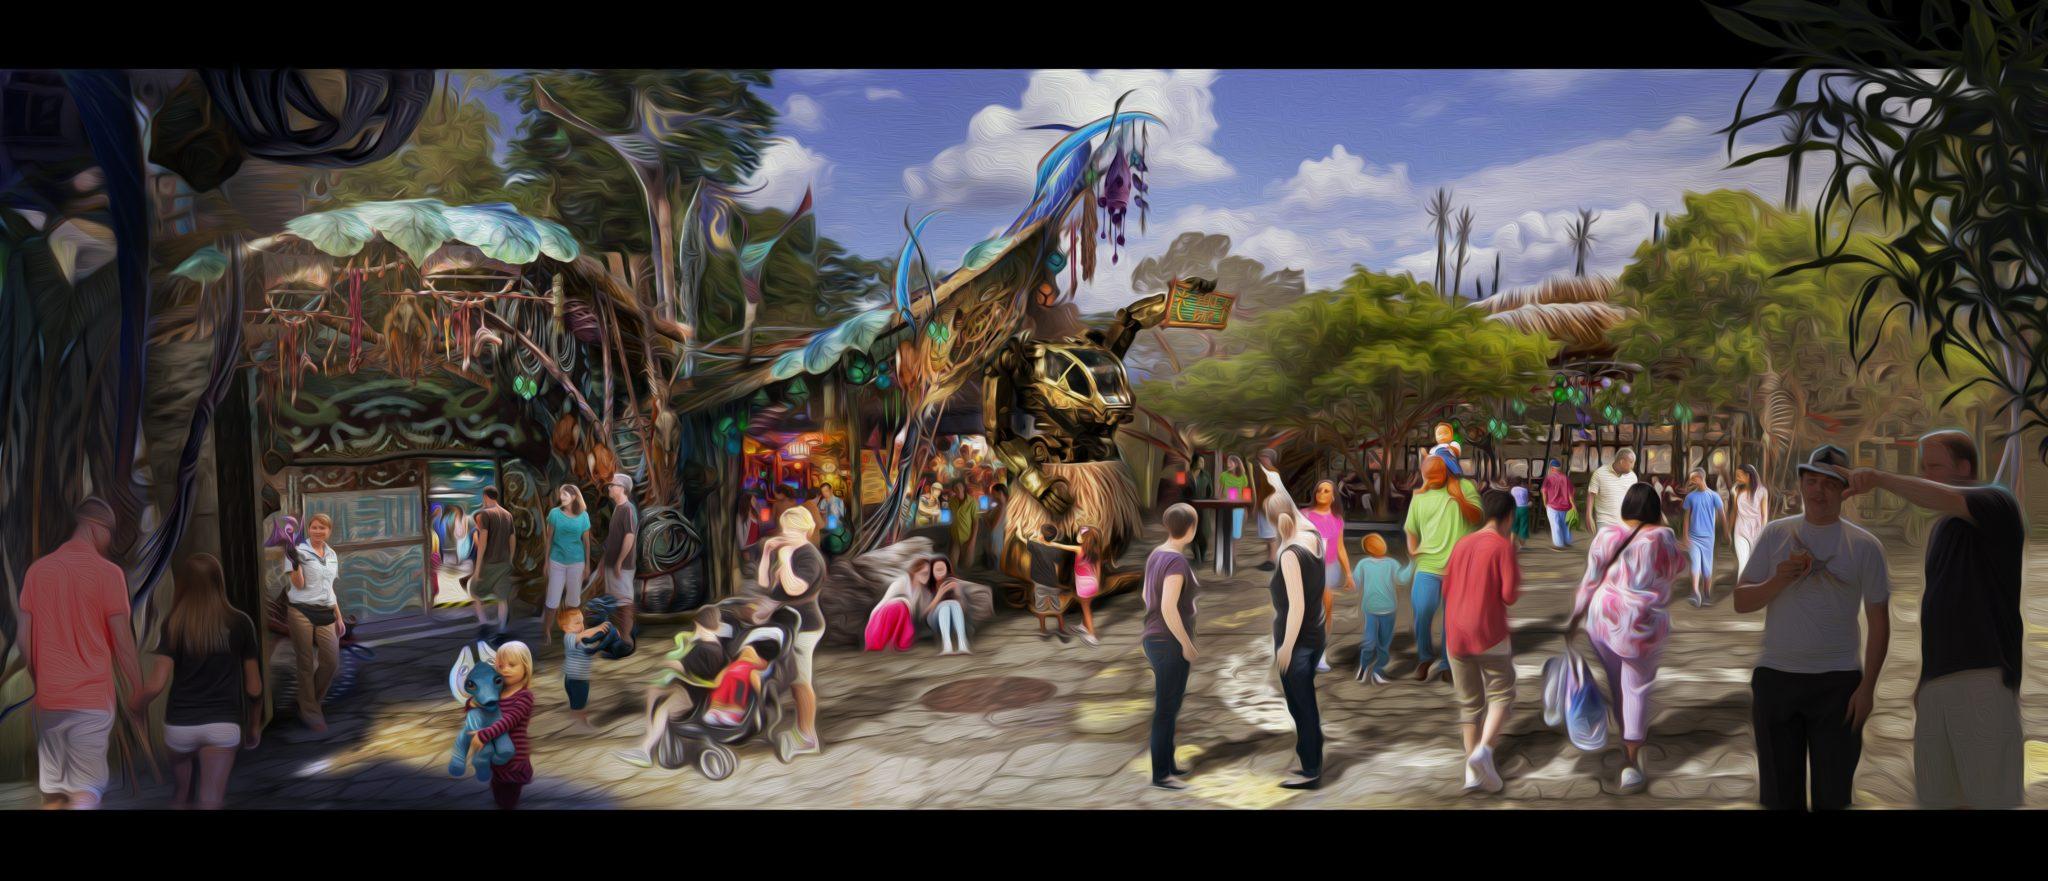 Walt Disney World, New at Walt Disney World, Avatar Land, New 2017 Walt Disney World Attractions